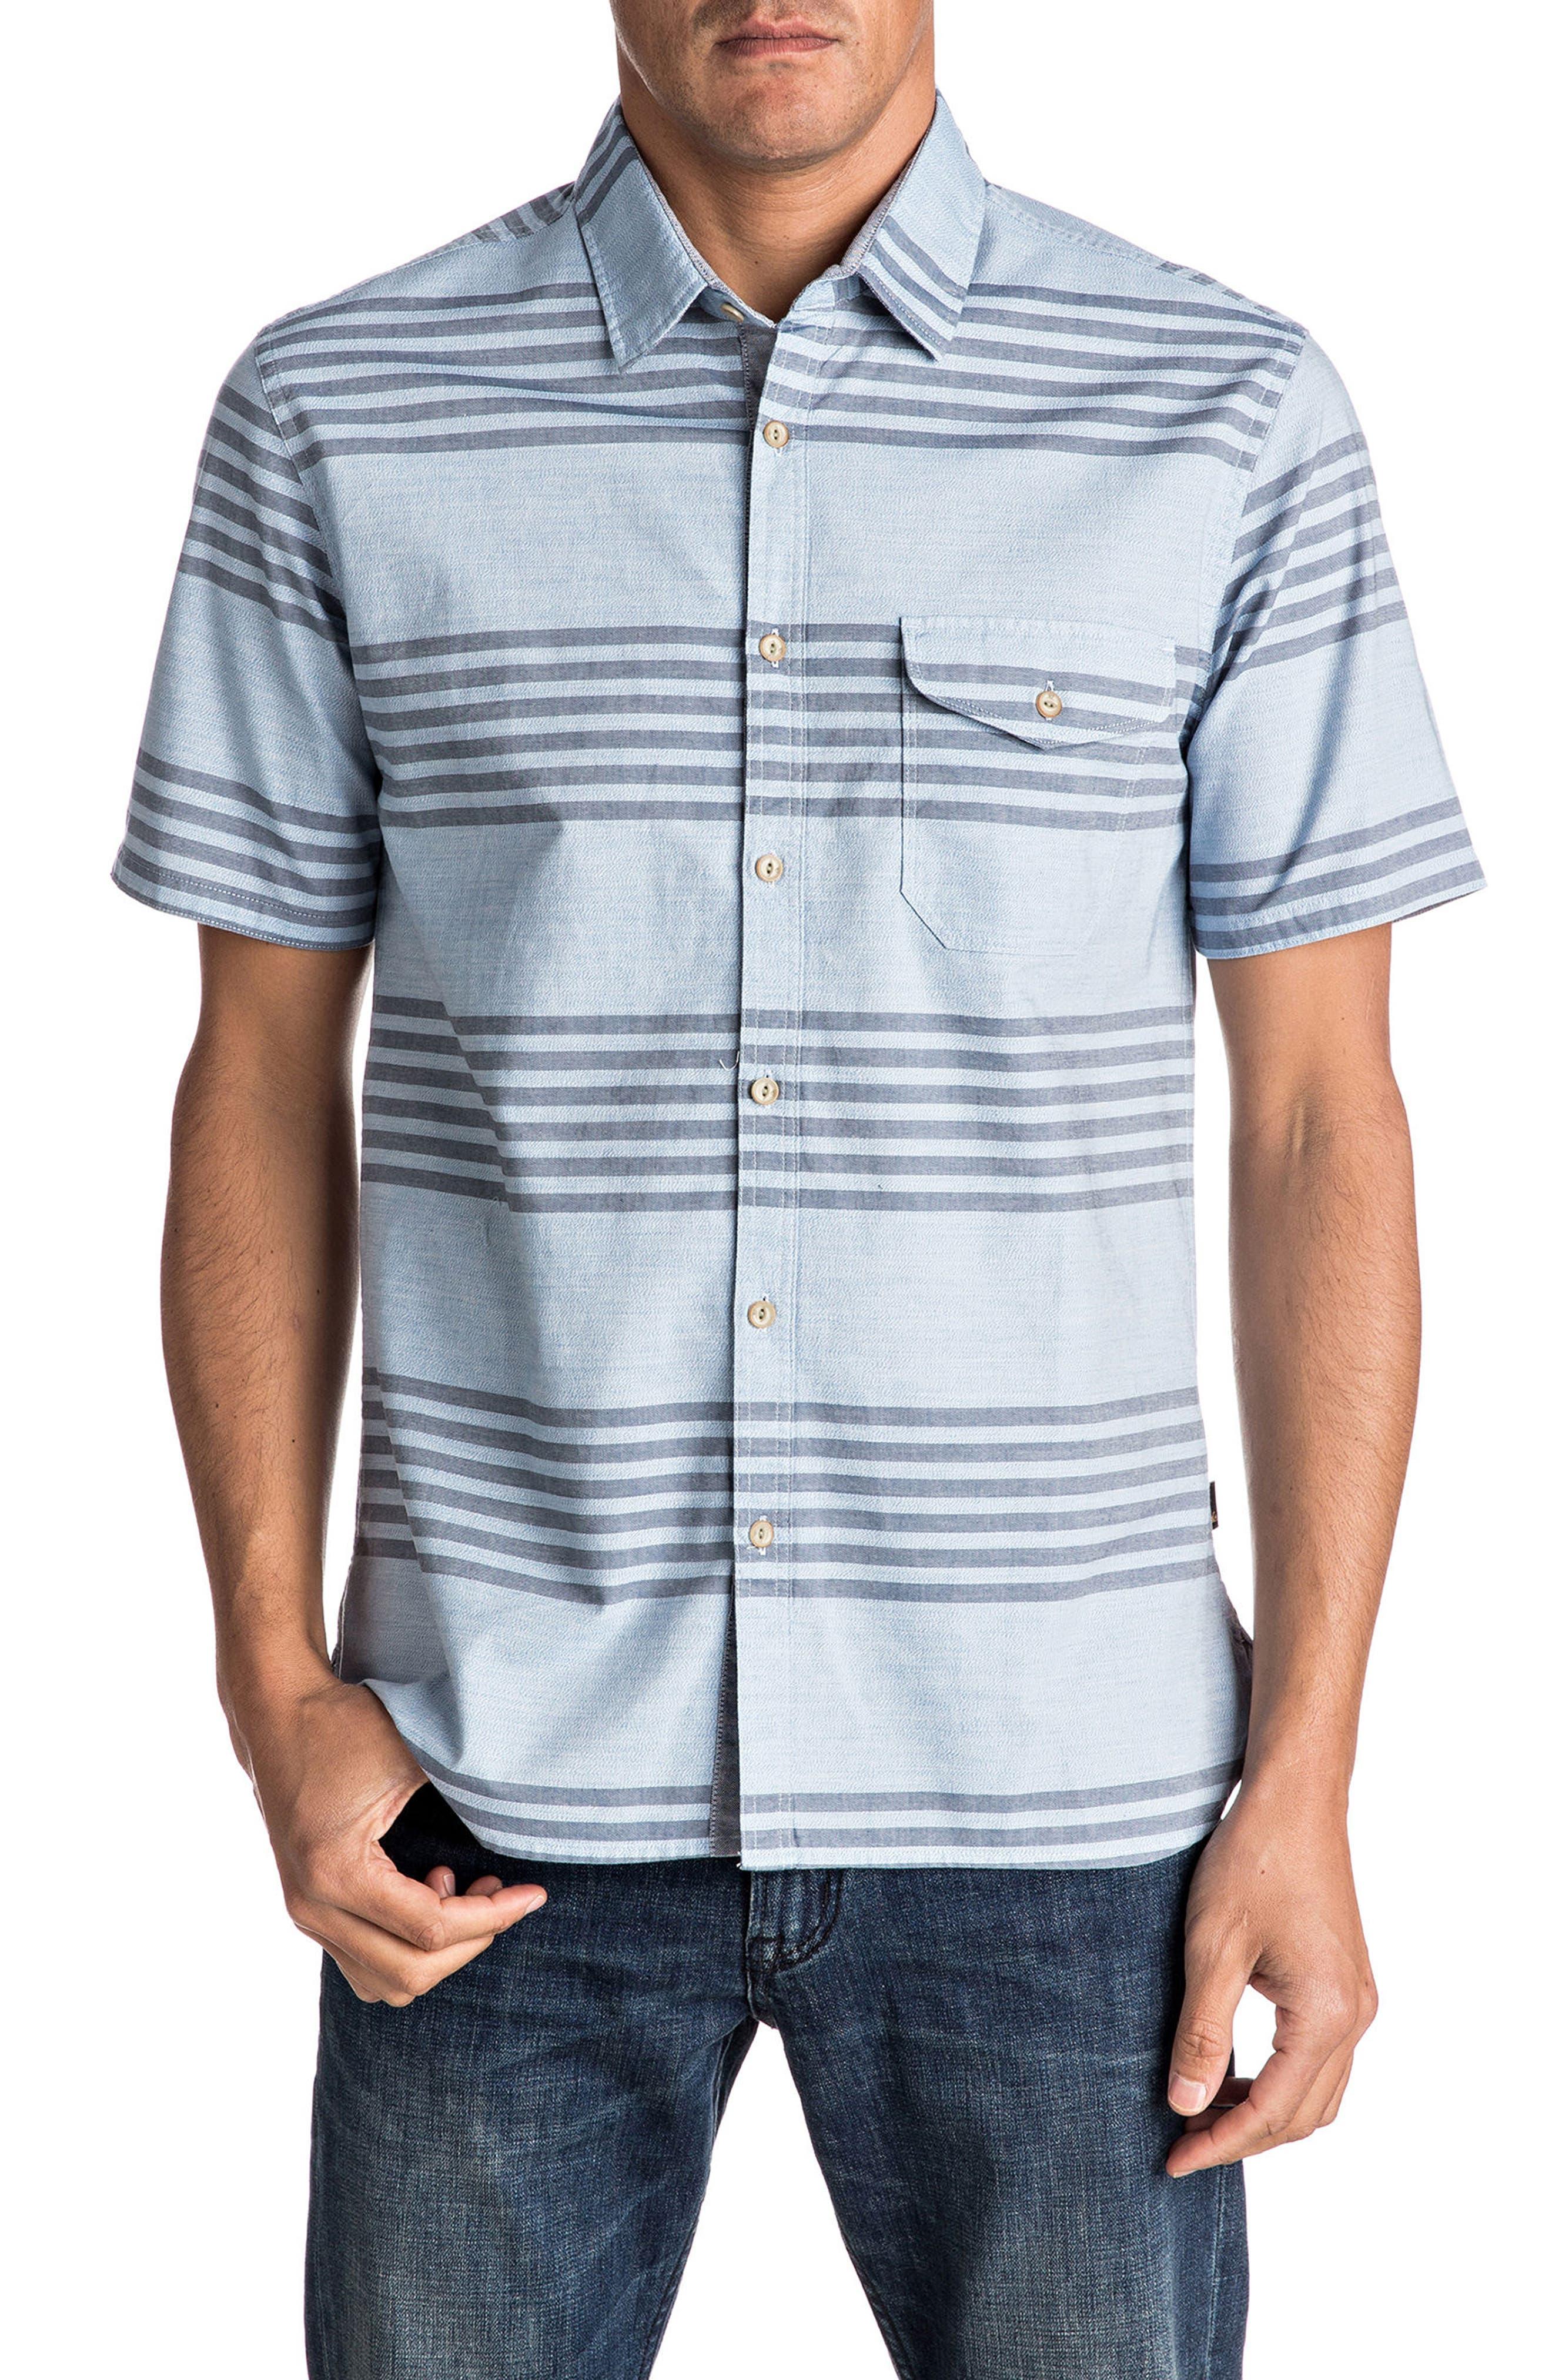 Quiksilver Srut Box Stripe Woven Shirt